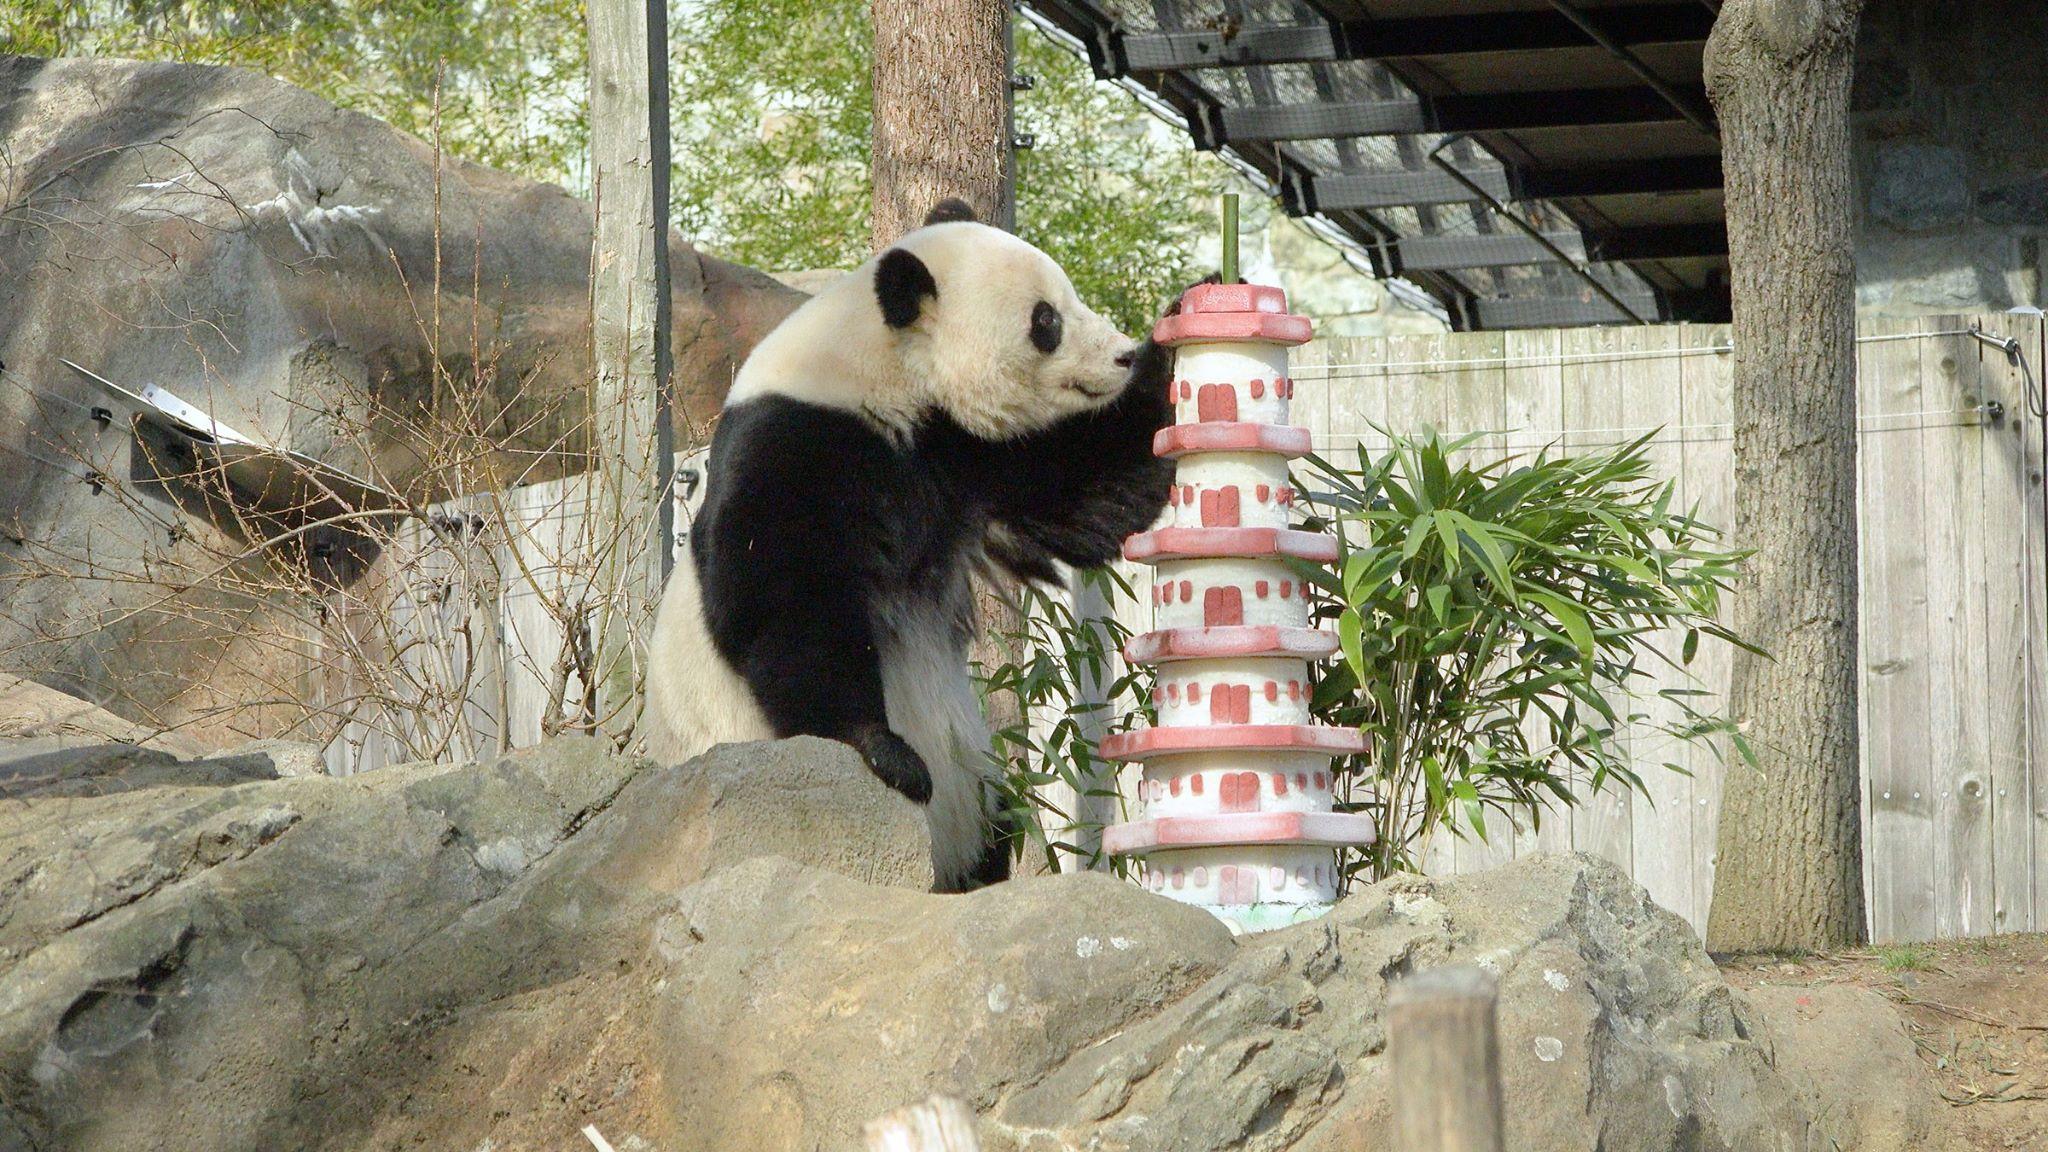 National Zoo Giant Panda Bao Bao Begins Her New Life In